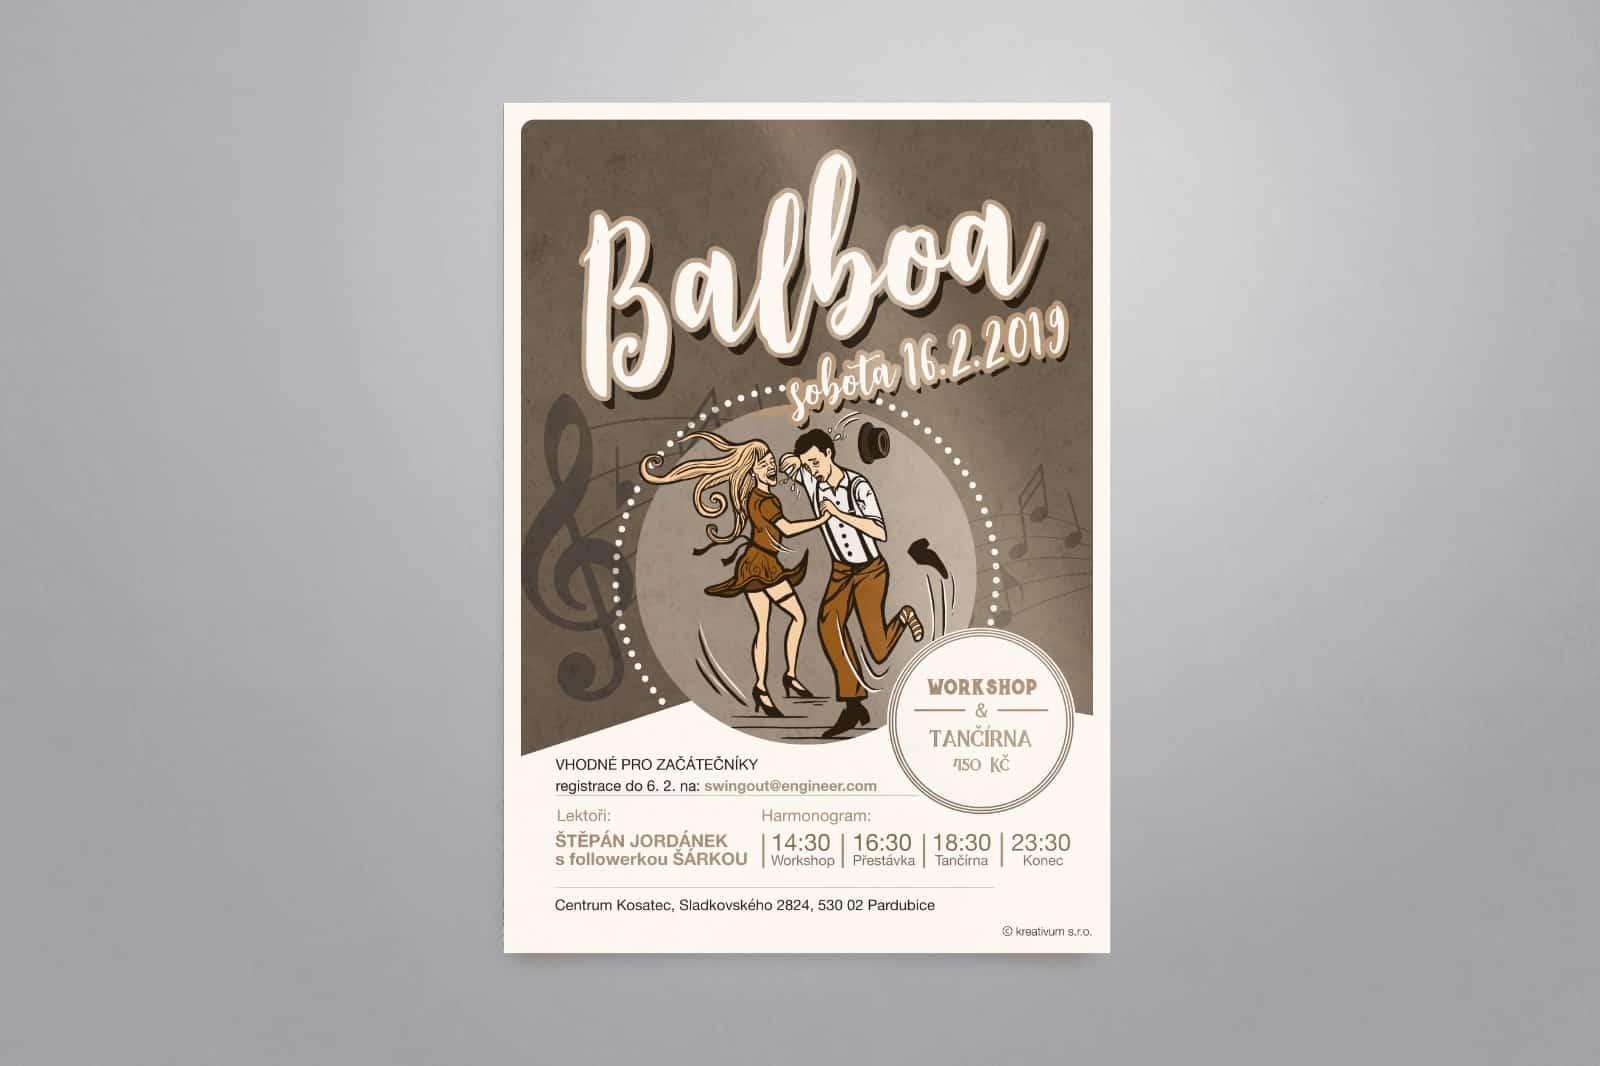 balboa_poster